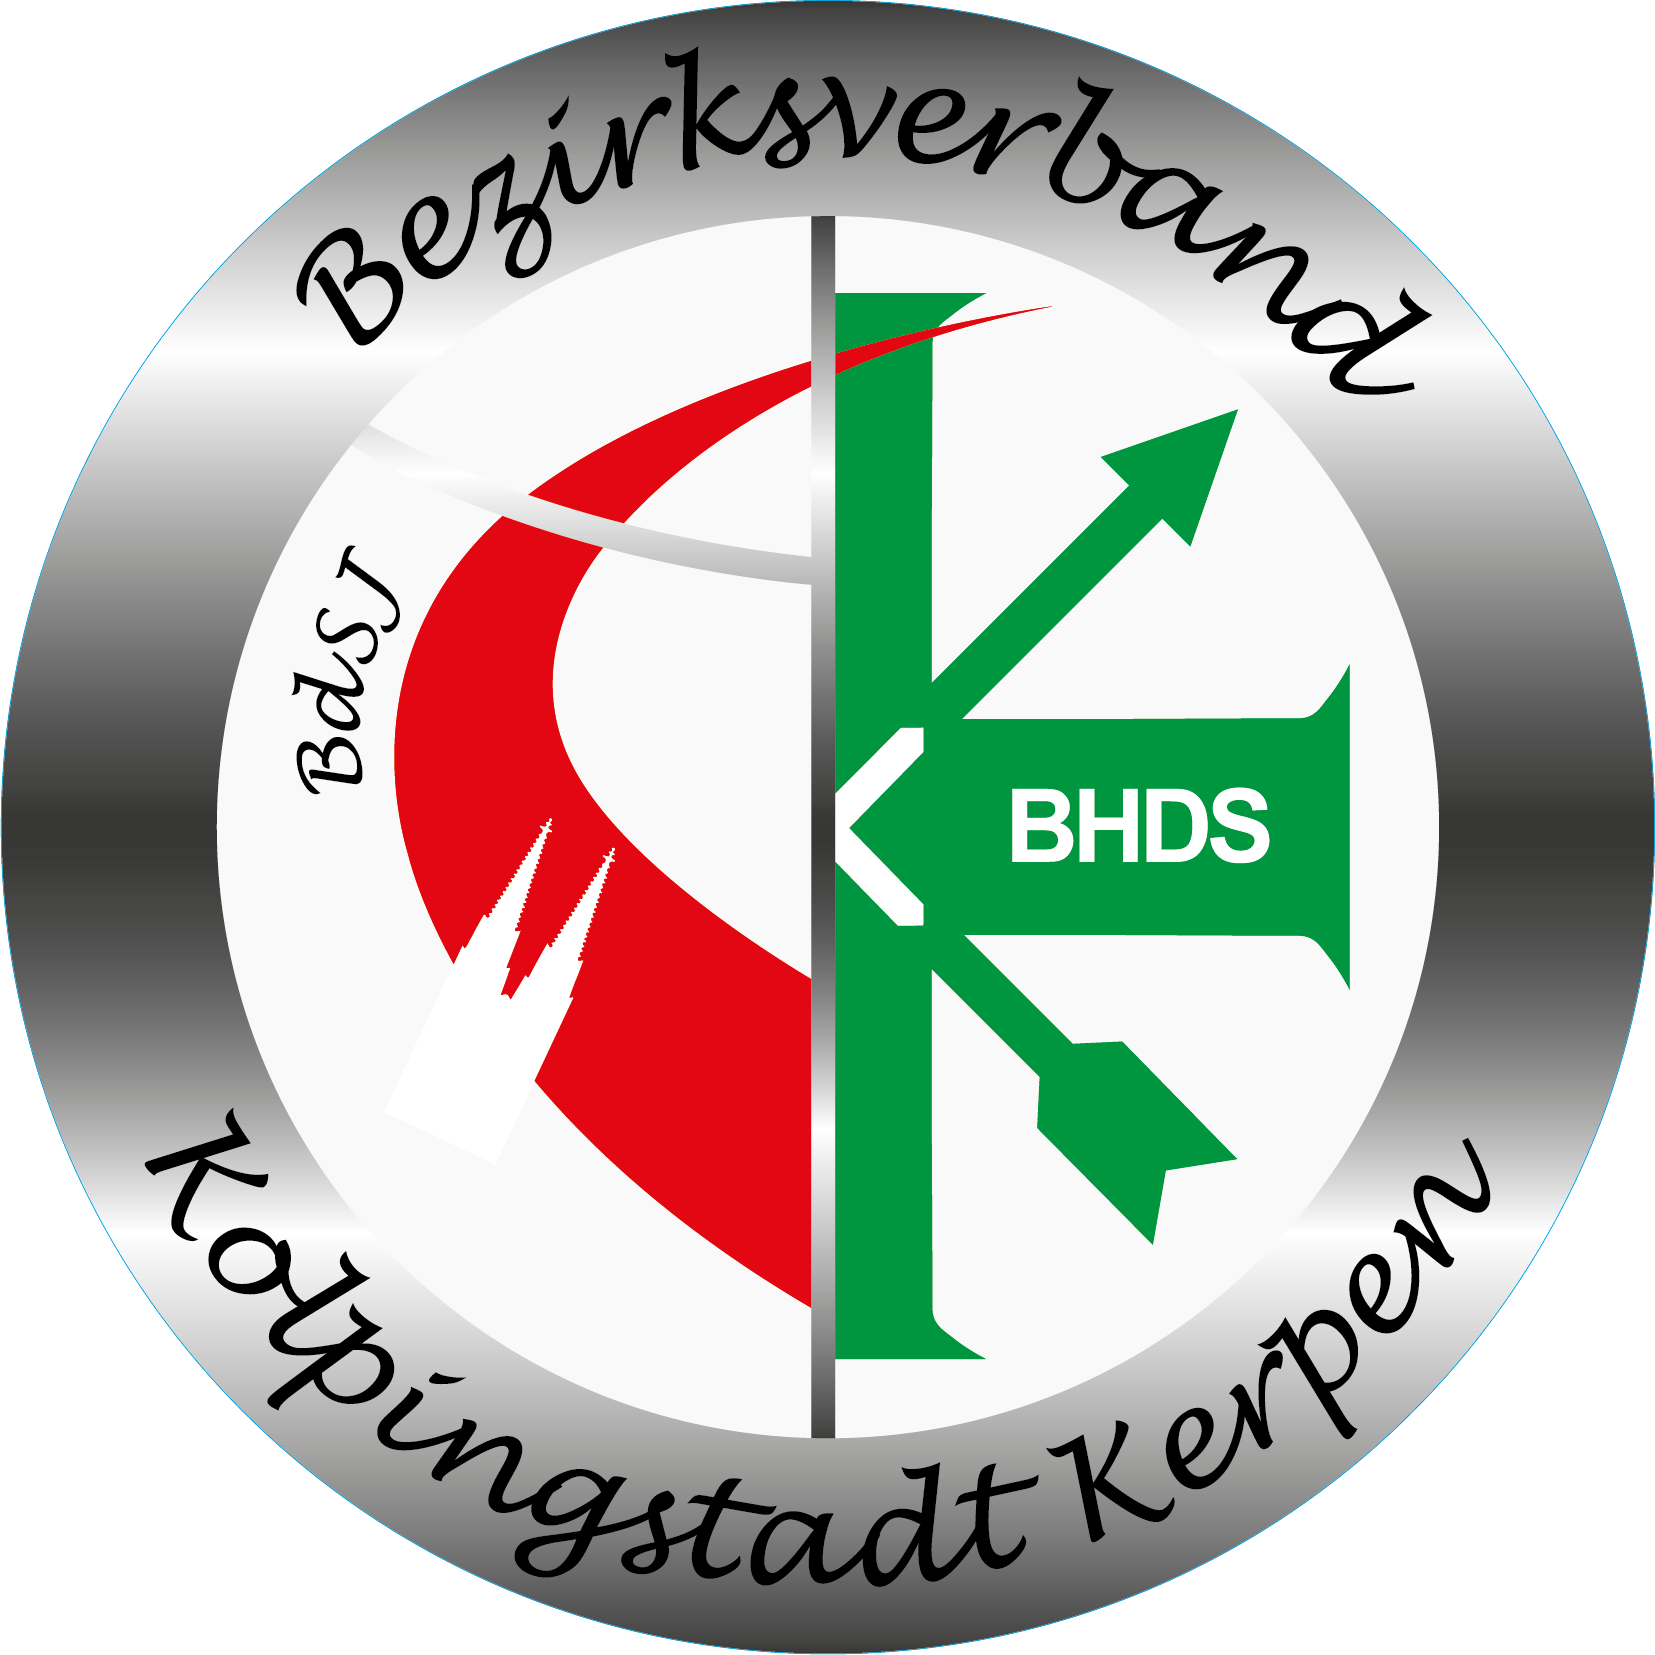 Bezirksverband Kolpingstadt Kerpen